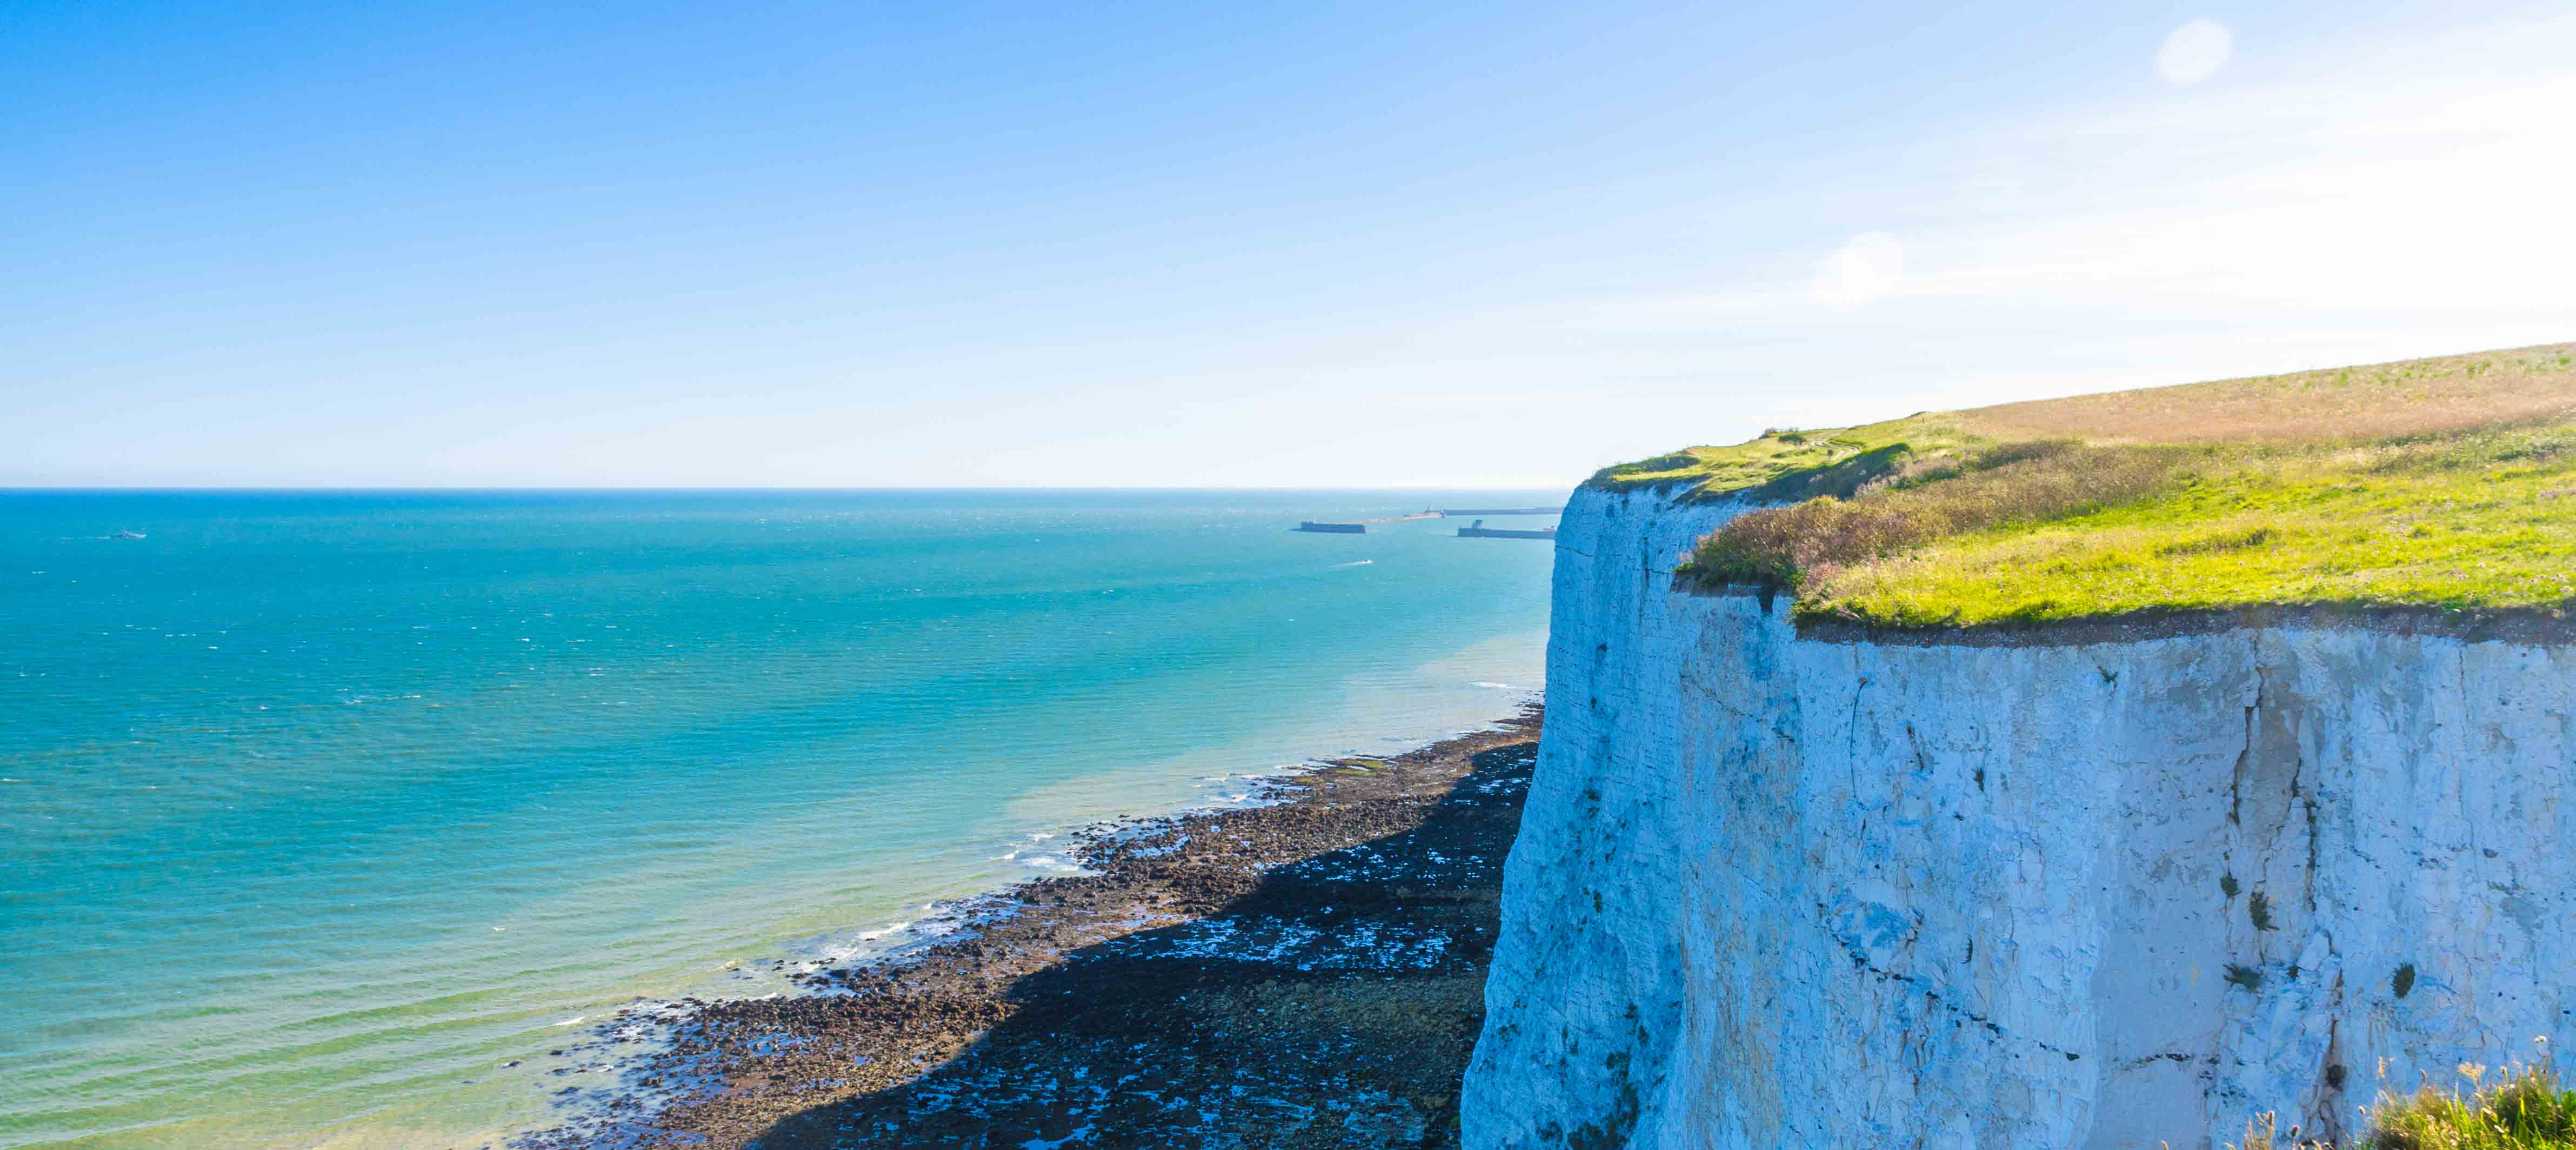 Dovers vita klippor i sydöstra England.